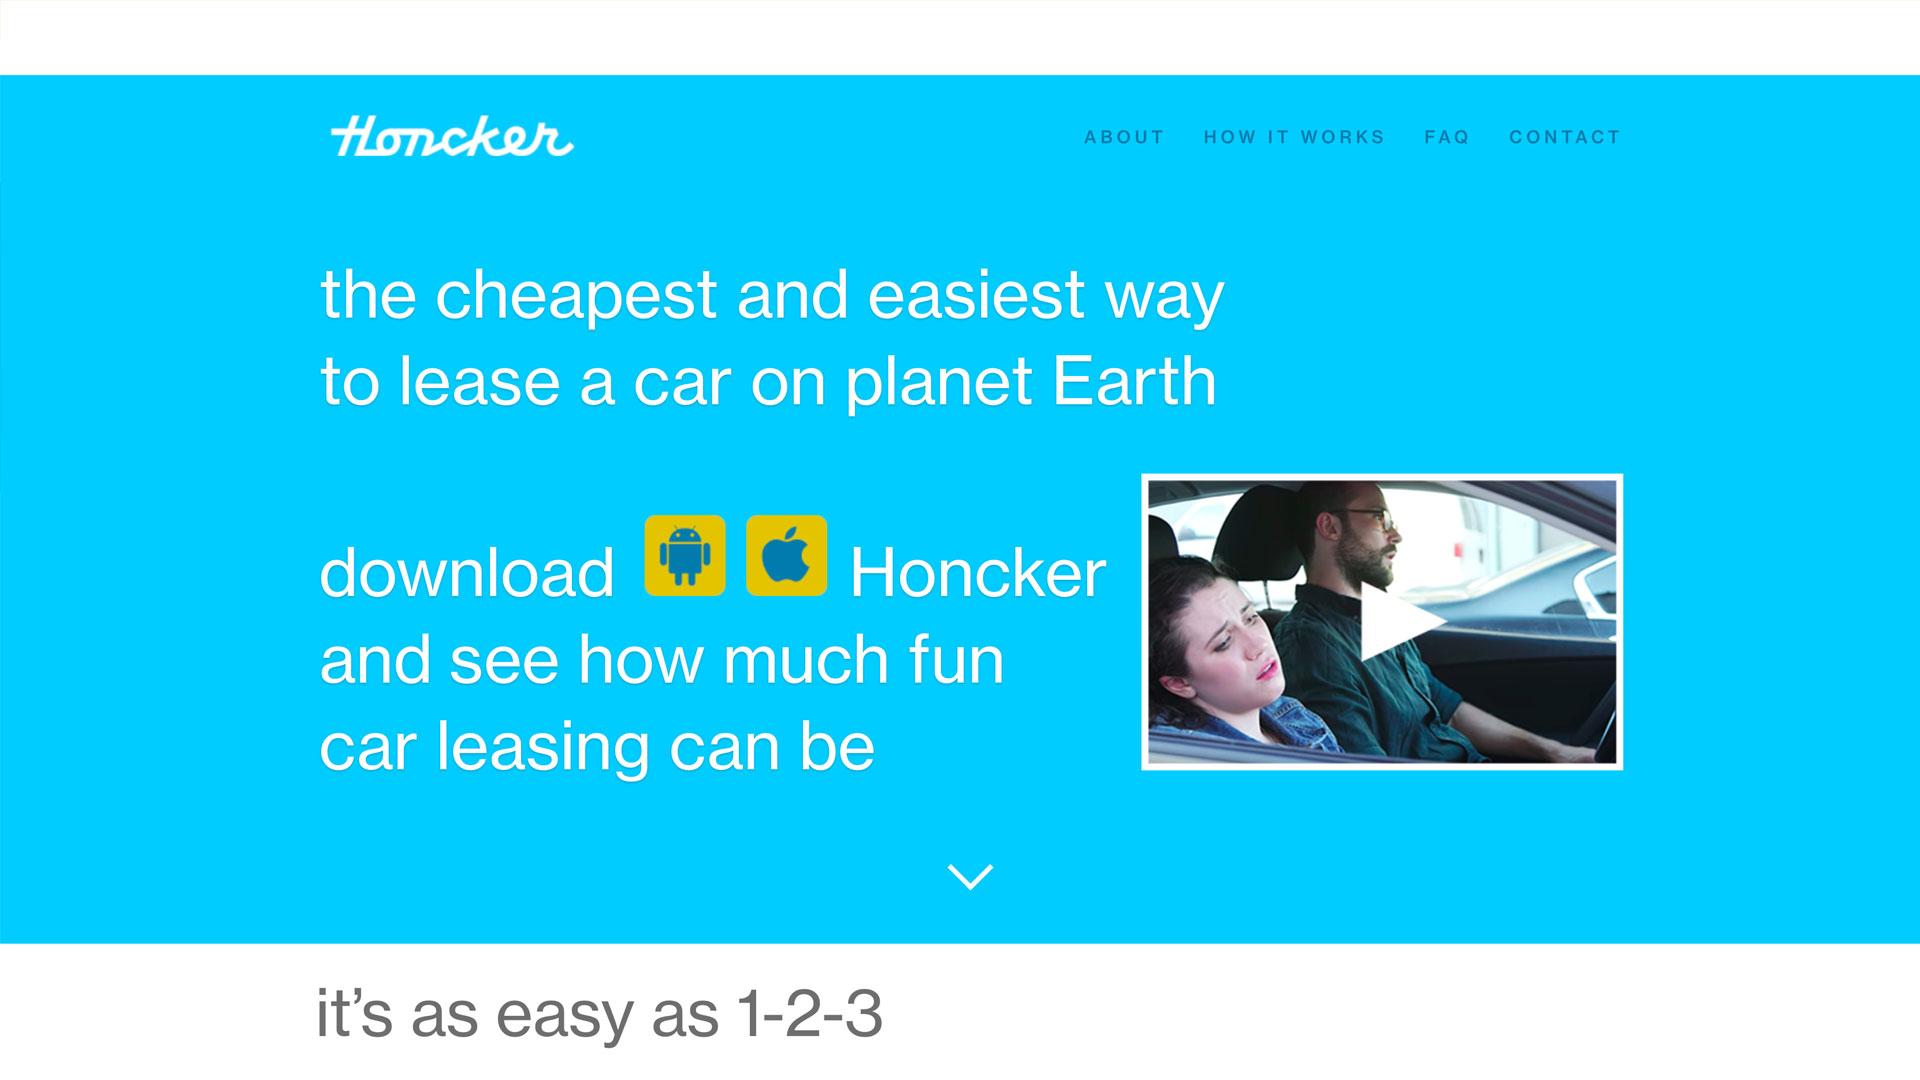 Honcker